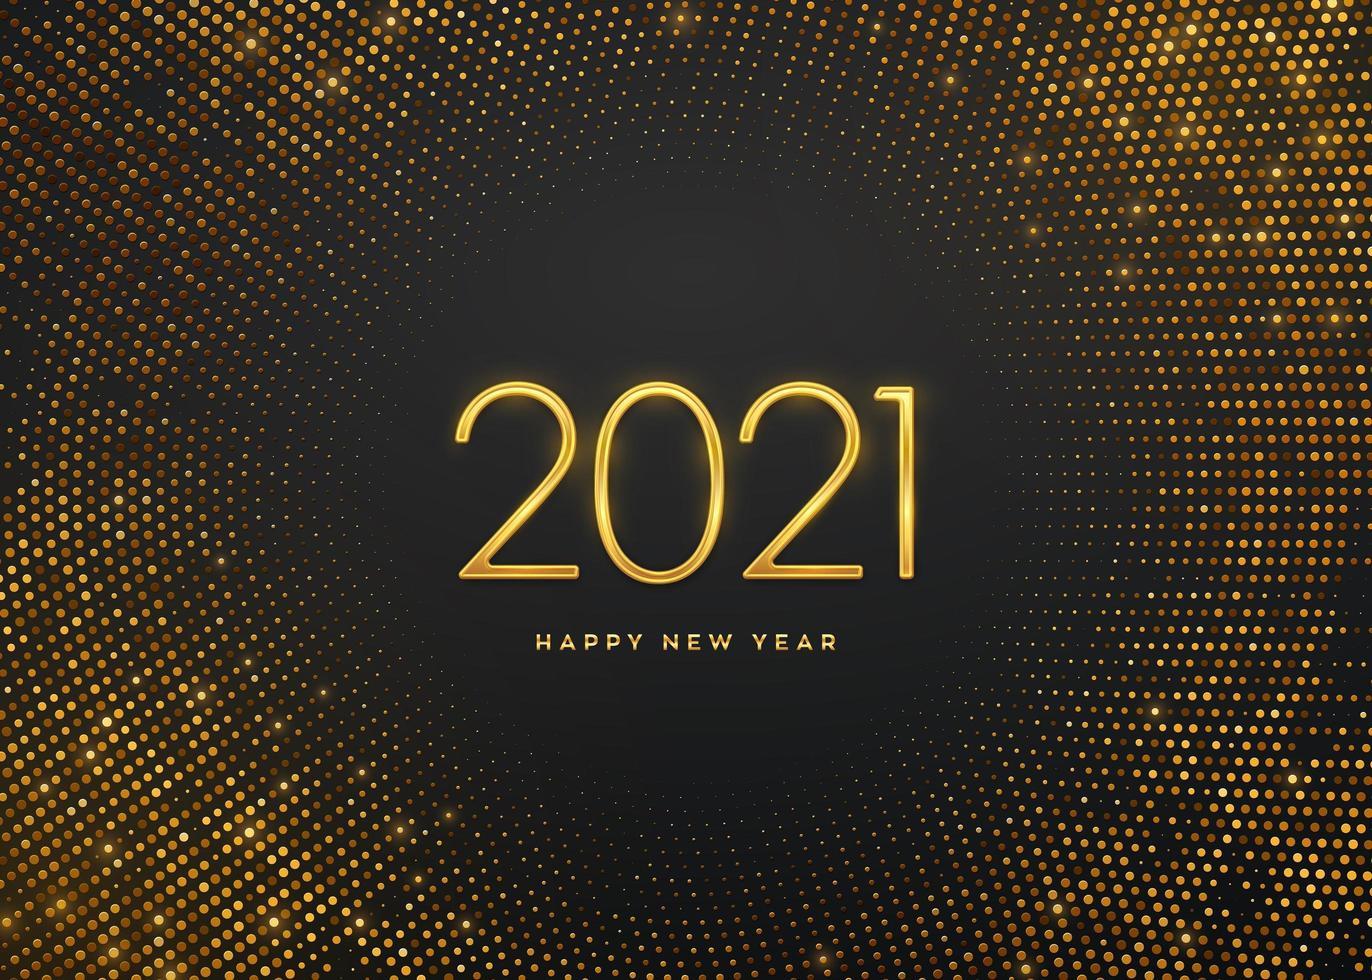 Frohes neues Jahr goldene Luxuszahlen 2021 vektor